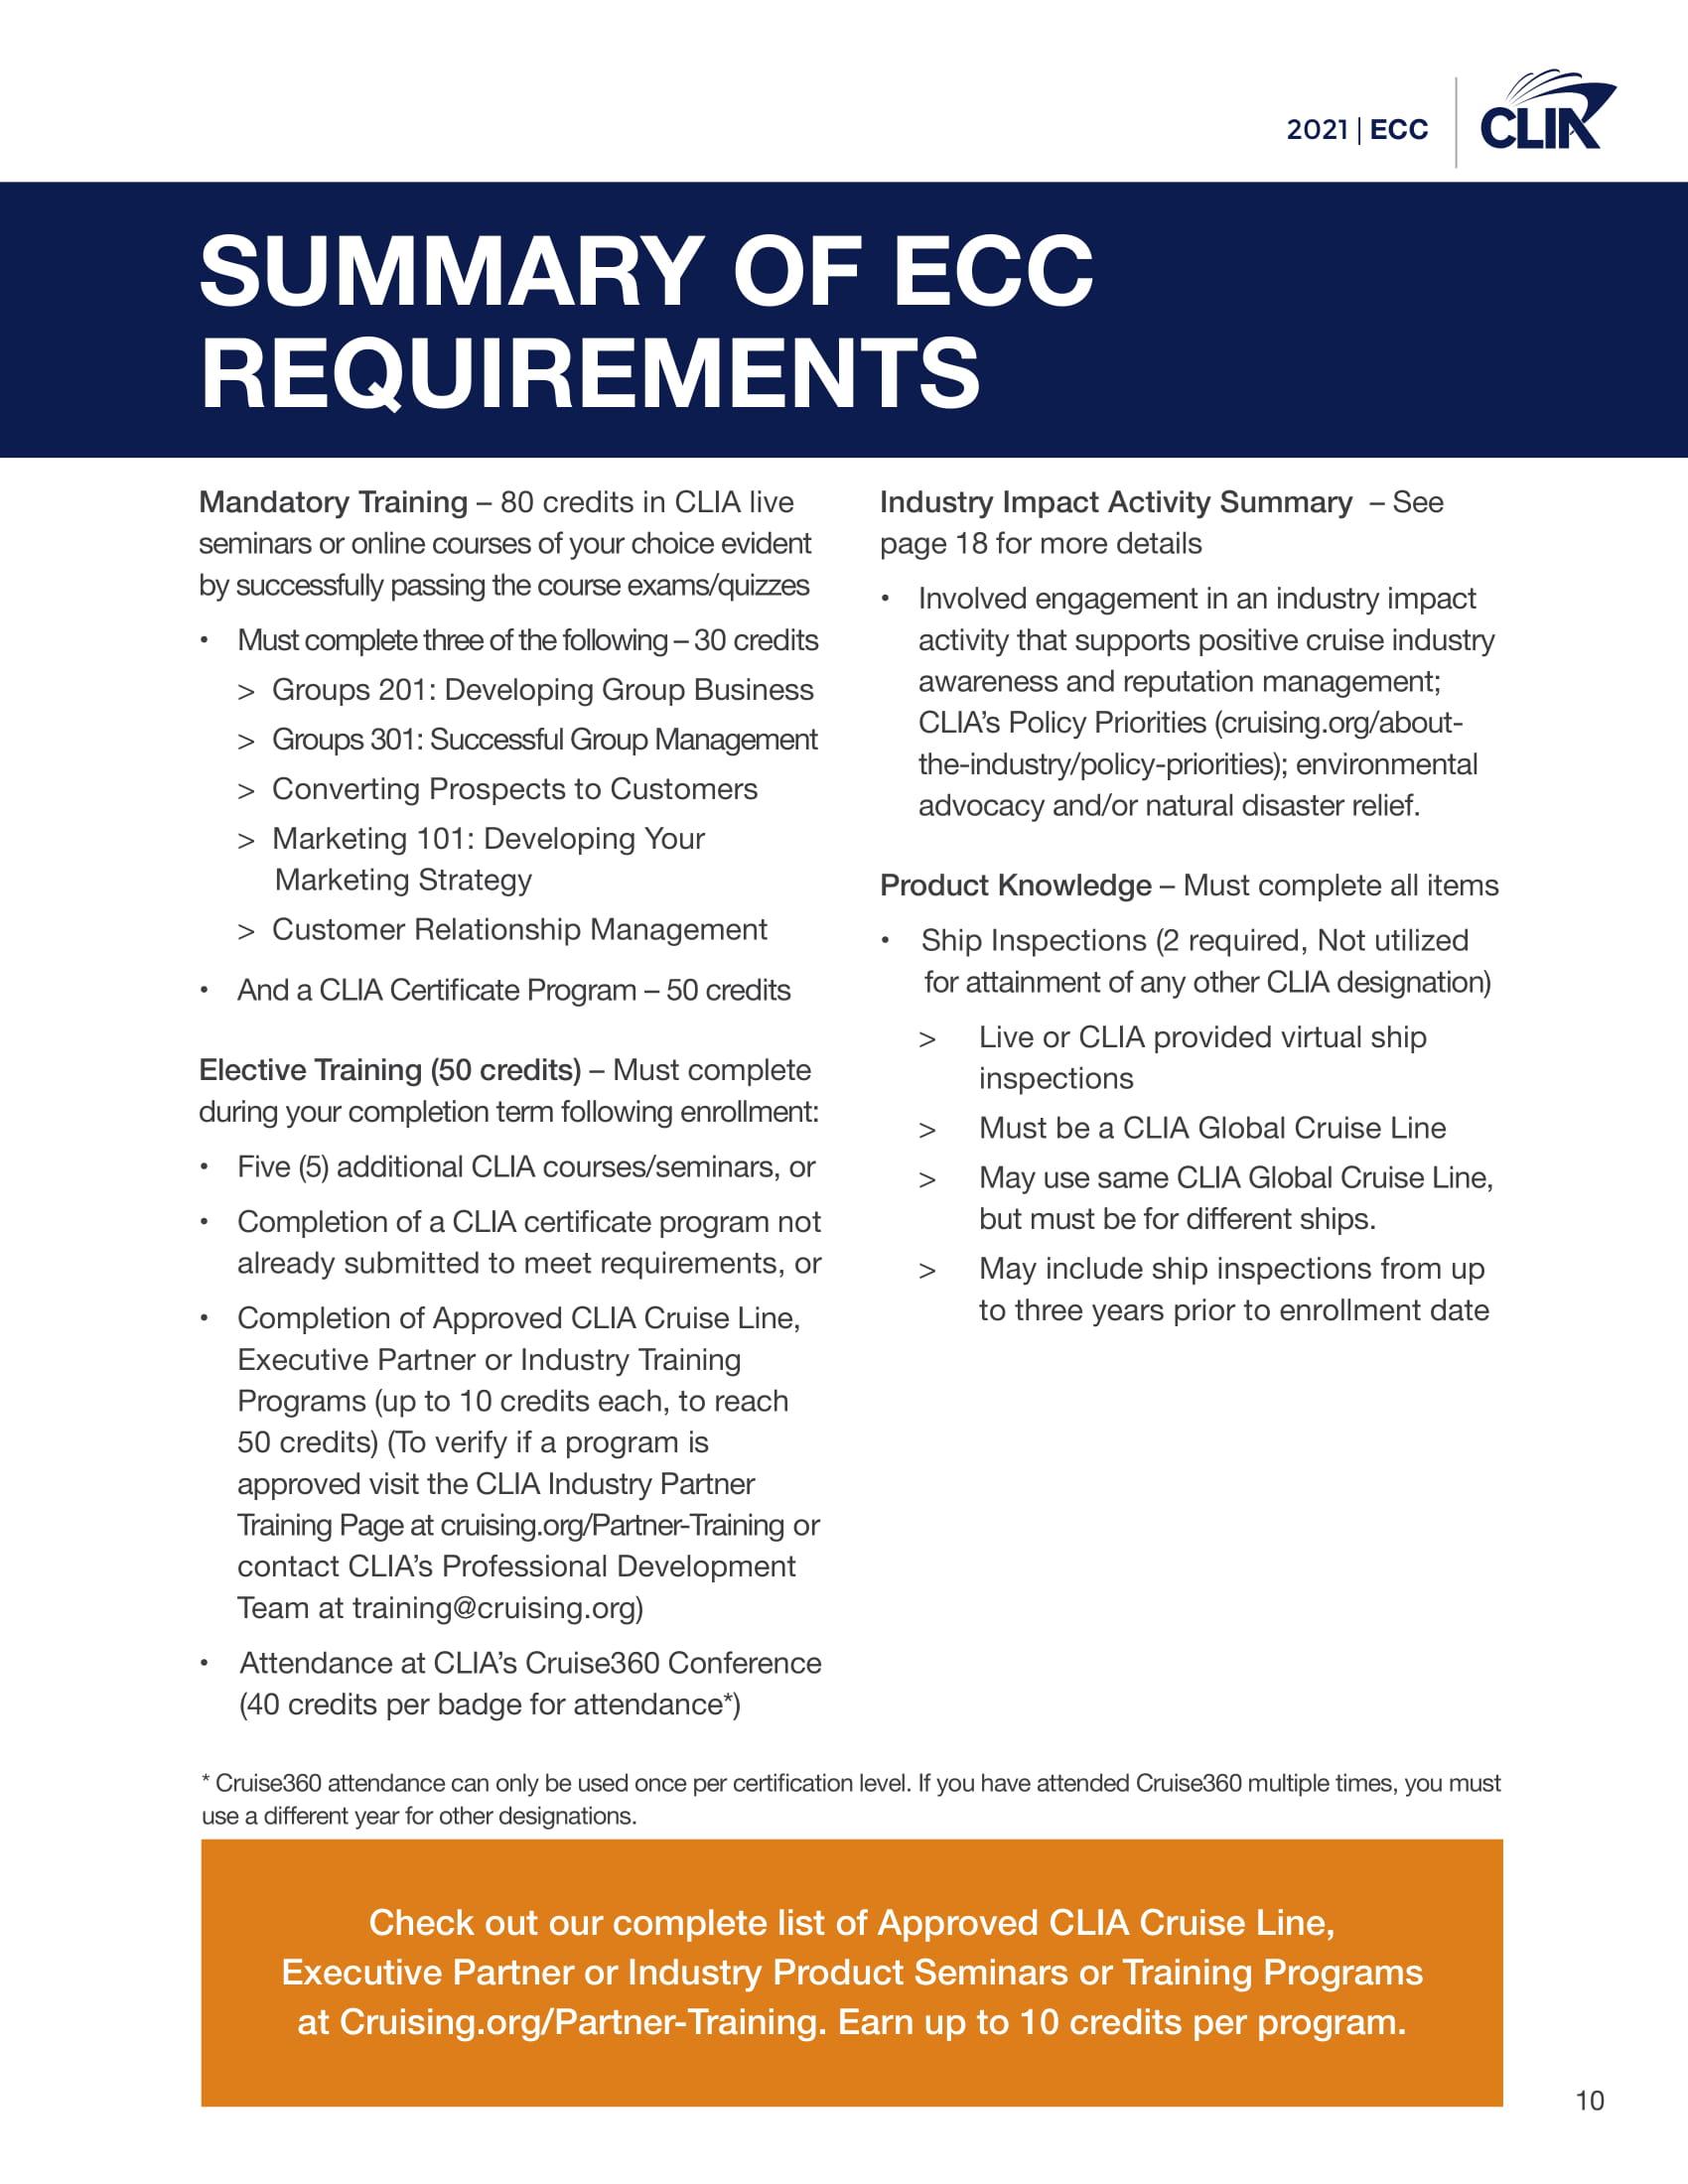 2021 Elite Cruise Counsellor Program - cliaecclogbook2021-1212020-10